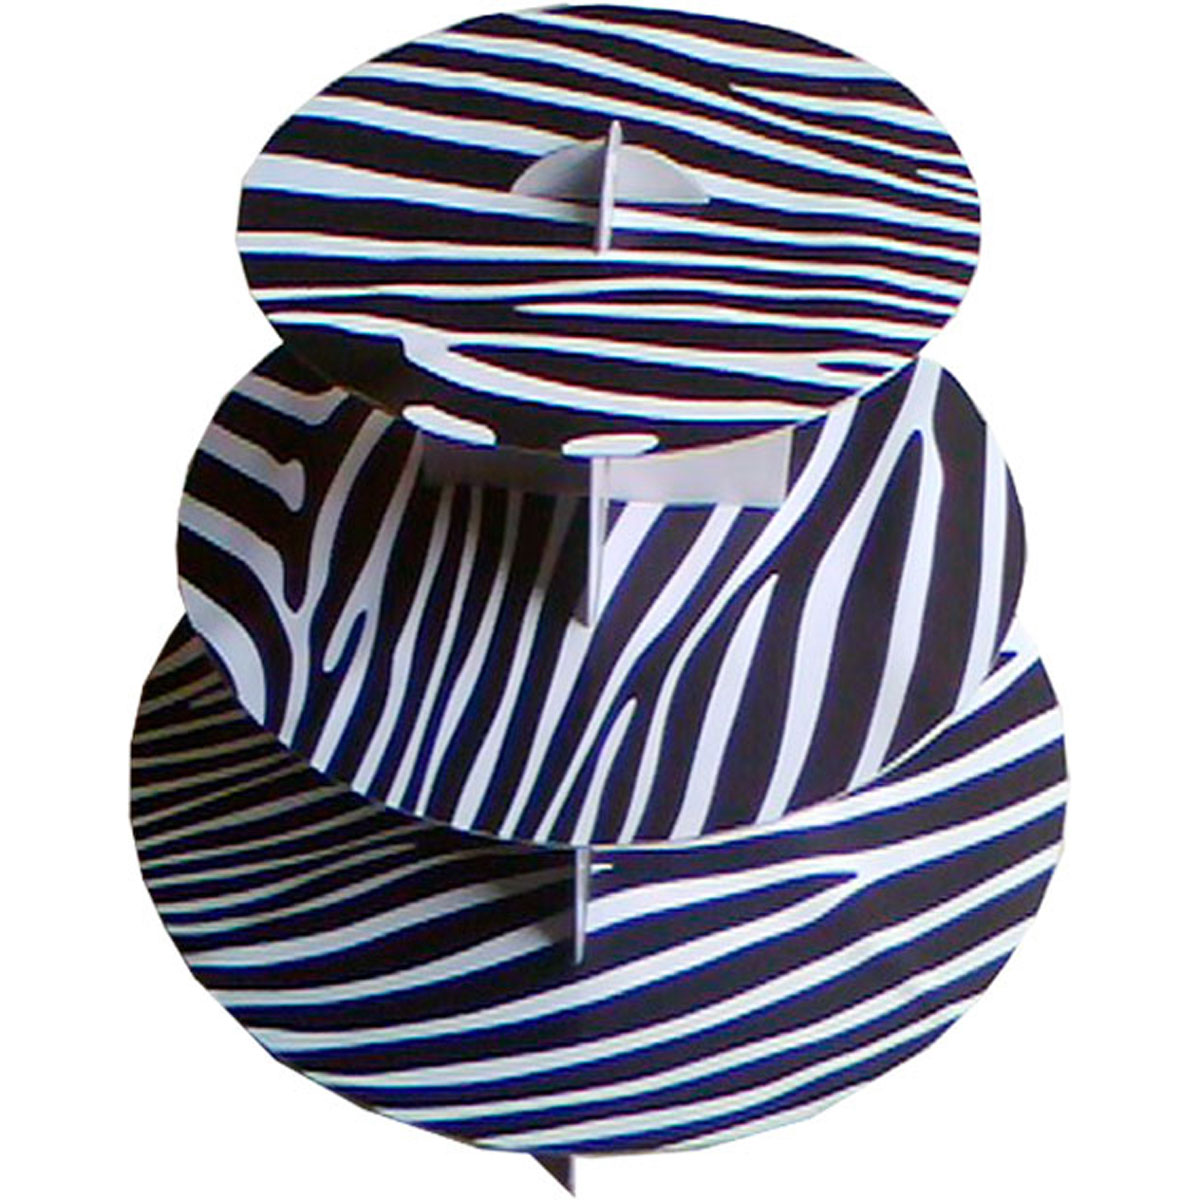 12 cupcake stand 3 tier cupcaketree zebra party favor wedding baby shower 1pc ebay. Black Bedroom Furniture Sets. Home Design Ideas